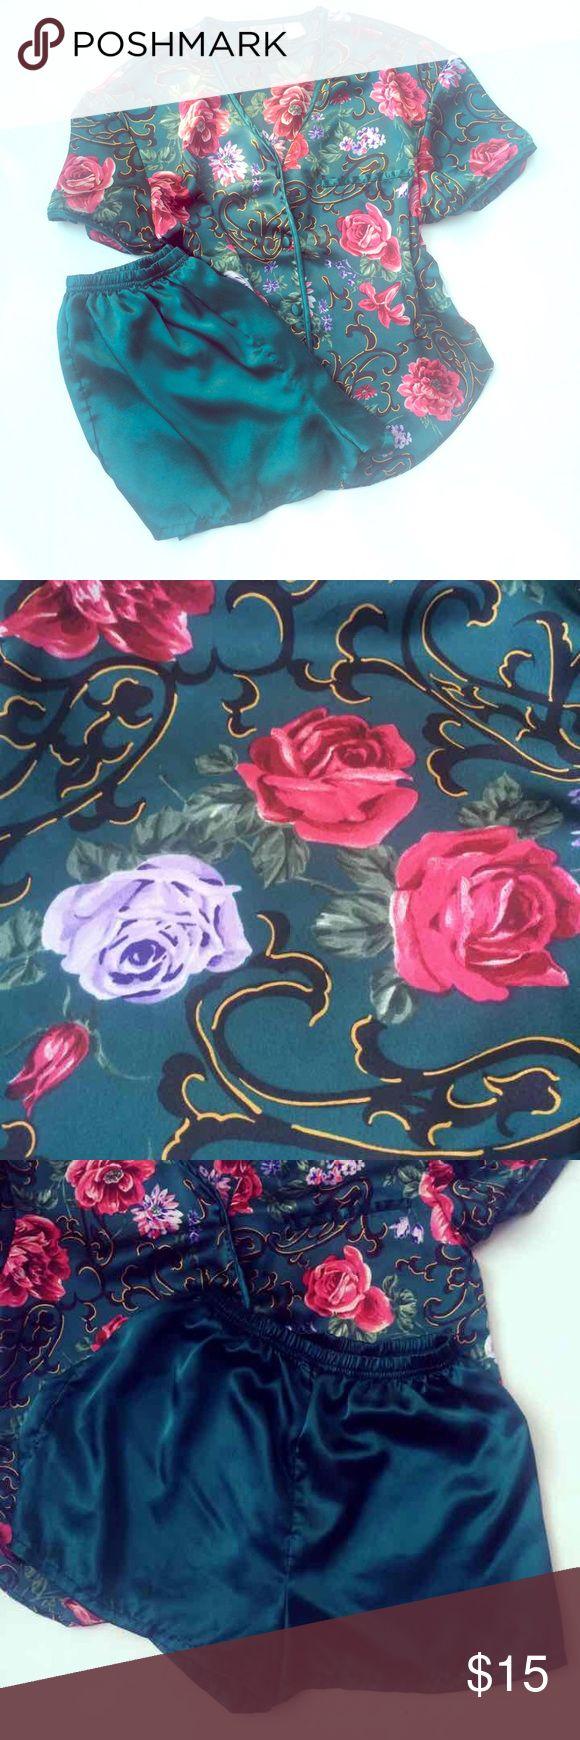 Beautiful Silky Vintage Floral Sleepwear Set Beautiful Silky Vintage Floral Sleepwear Set Size Small. Elastic waist band. Intimates & Sleepwear Pajamas